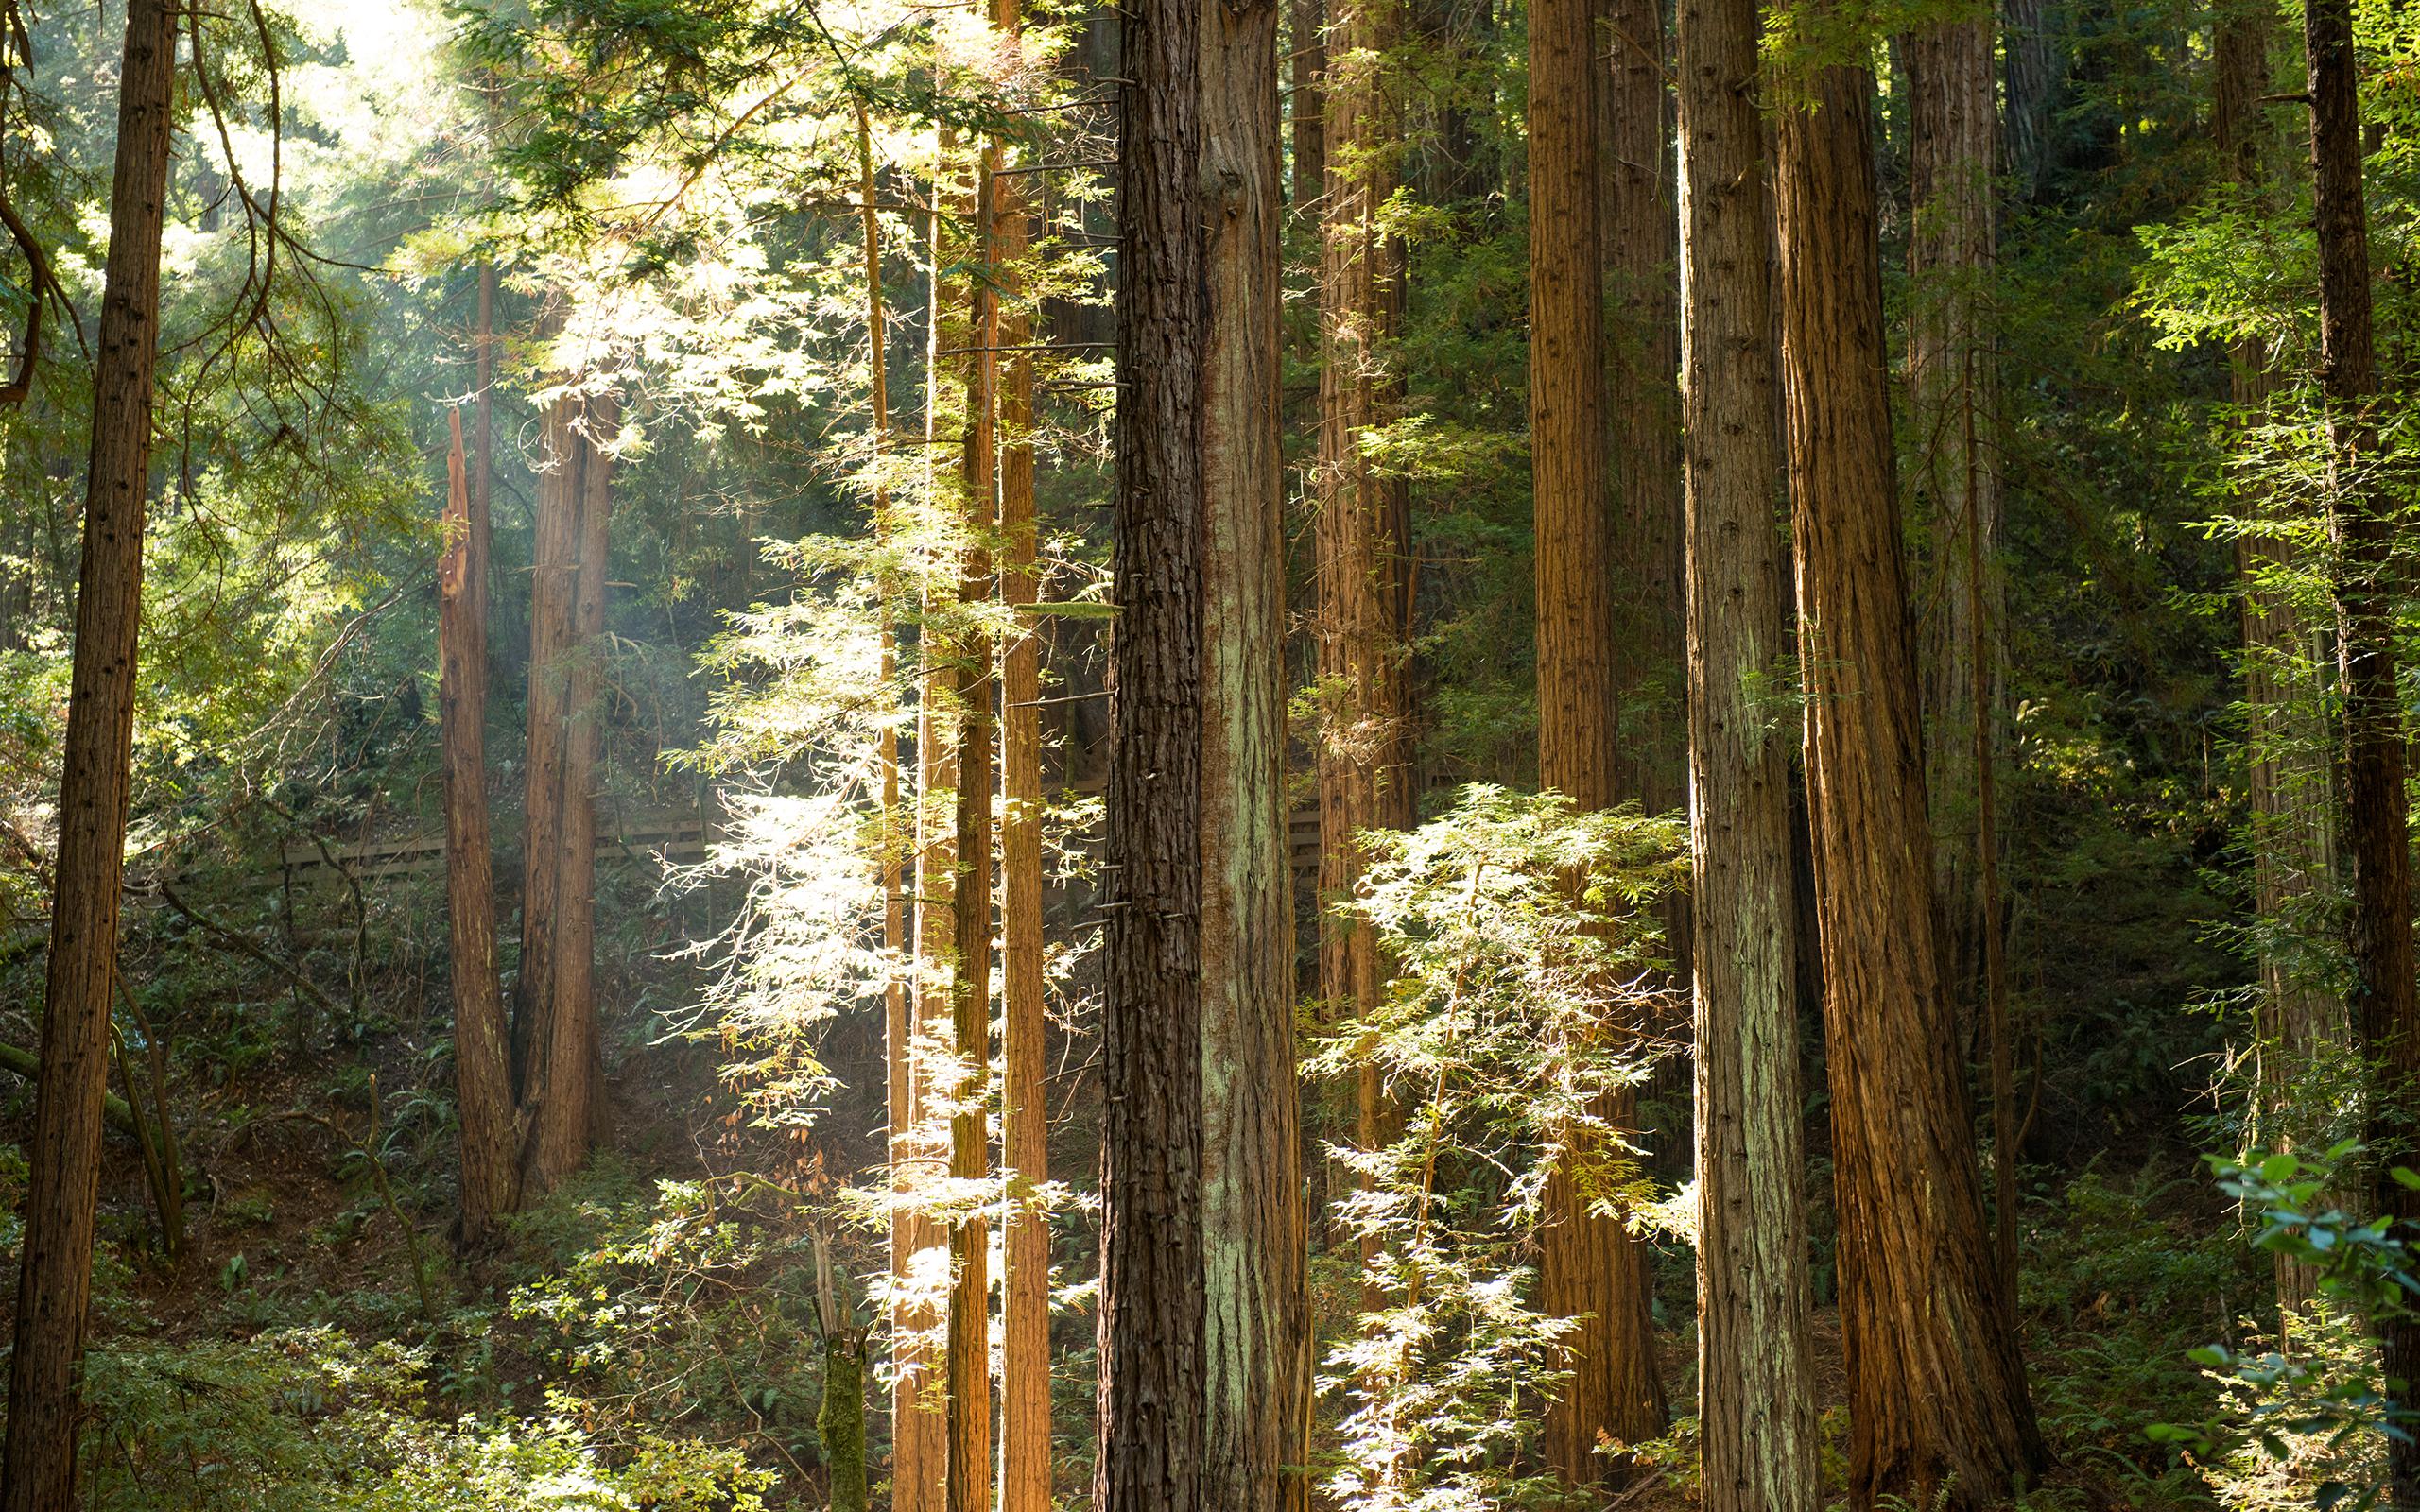 34 Redwood Forest Hd Wallpaper On Wallpapersafari